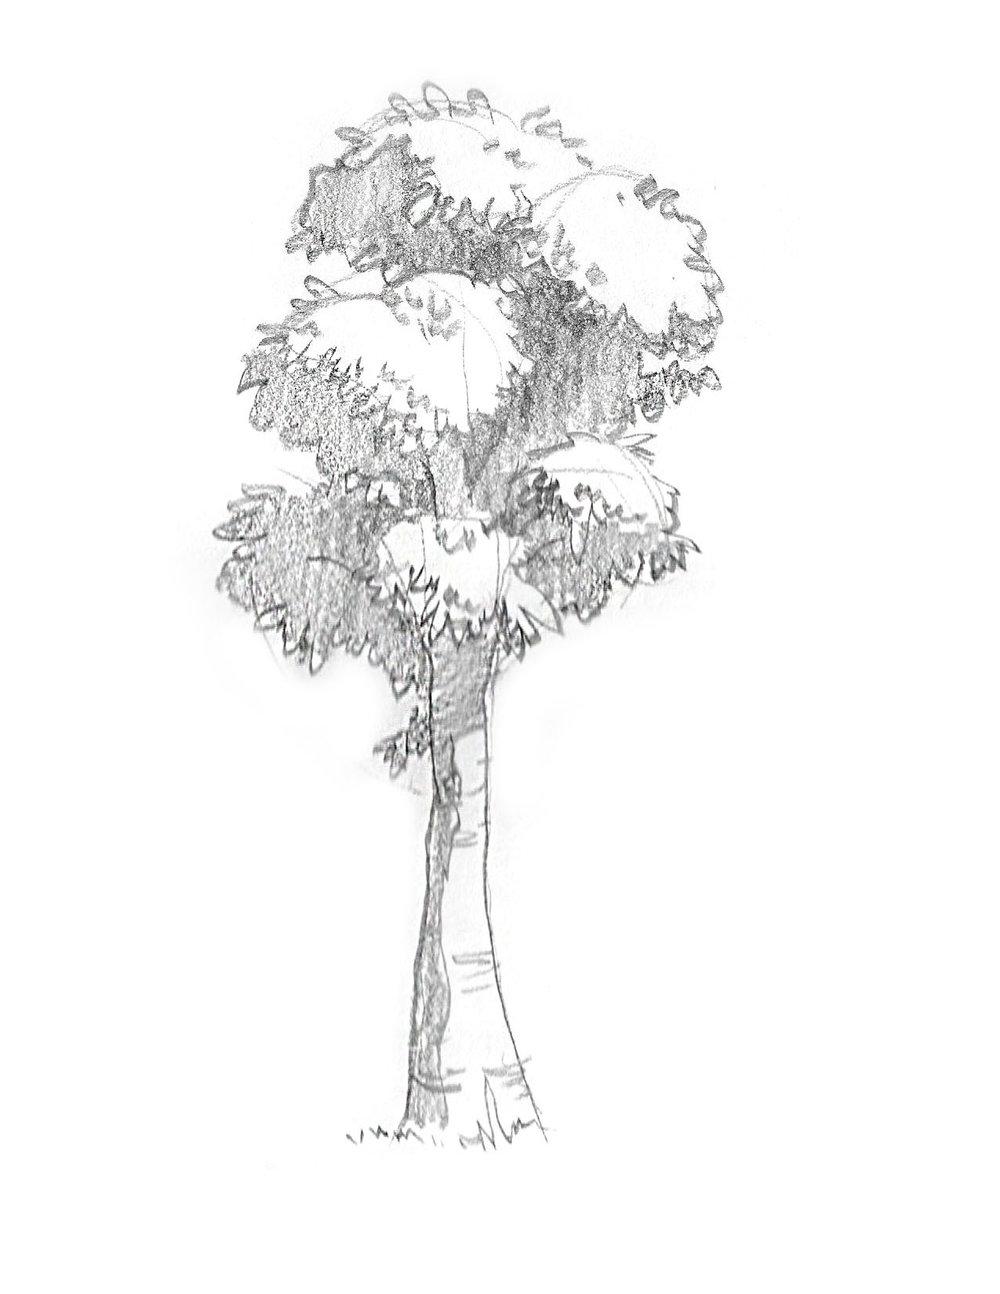 2018-09_Tree 06.jpg